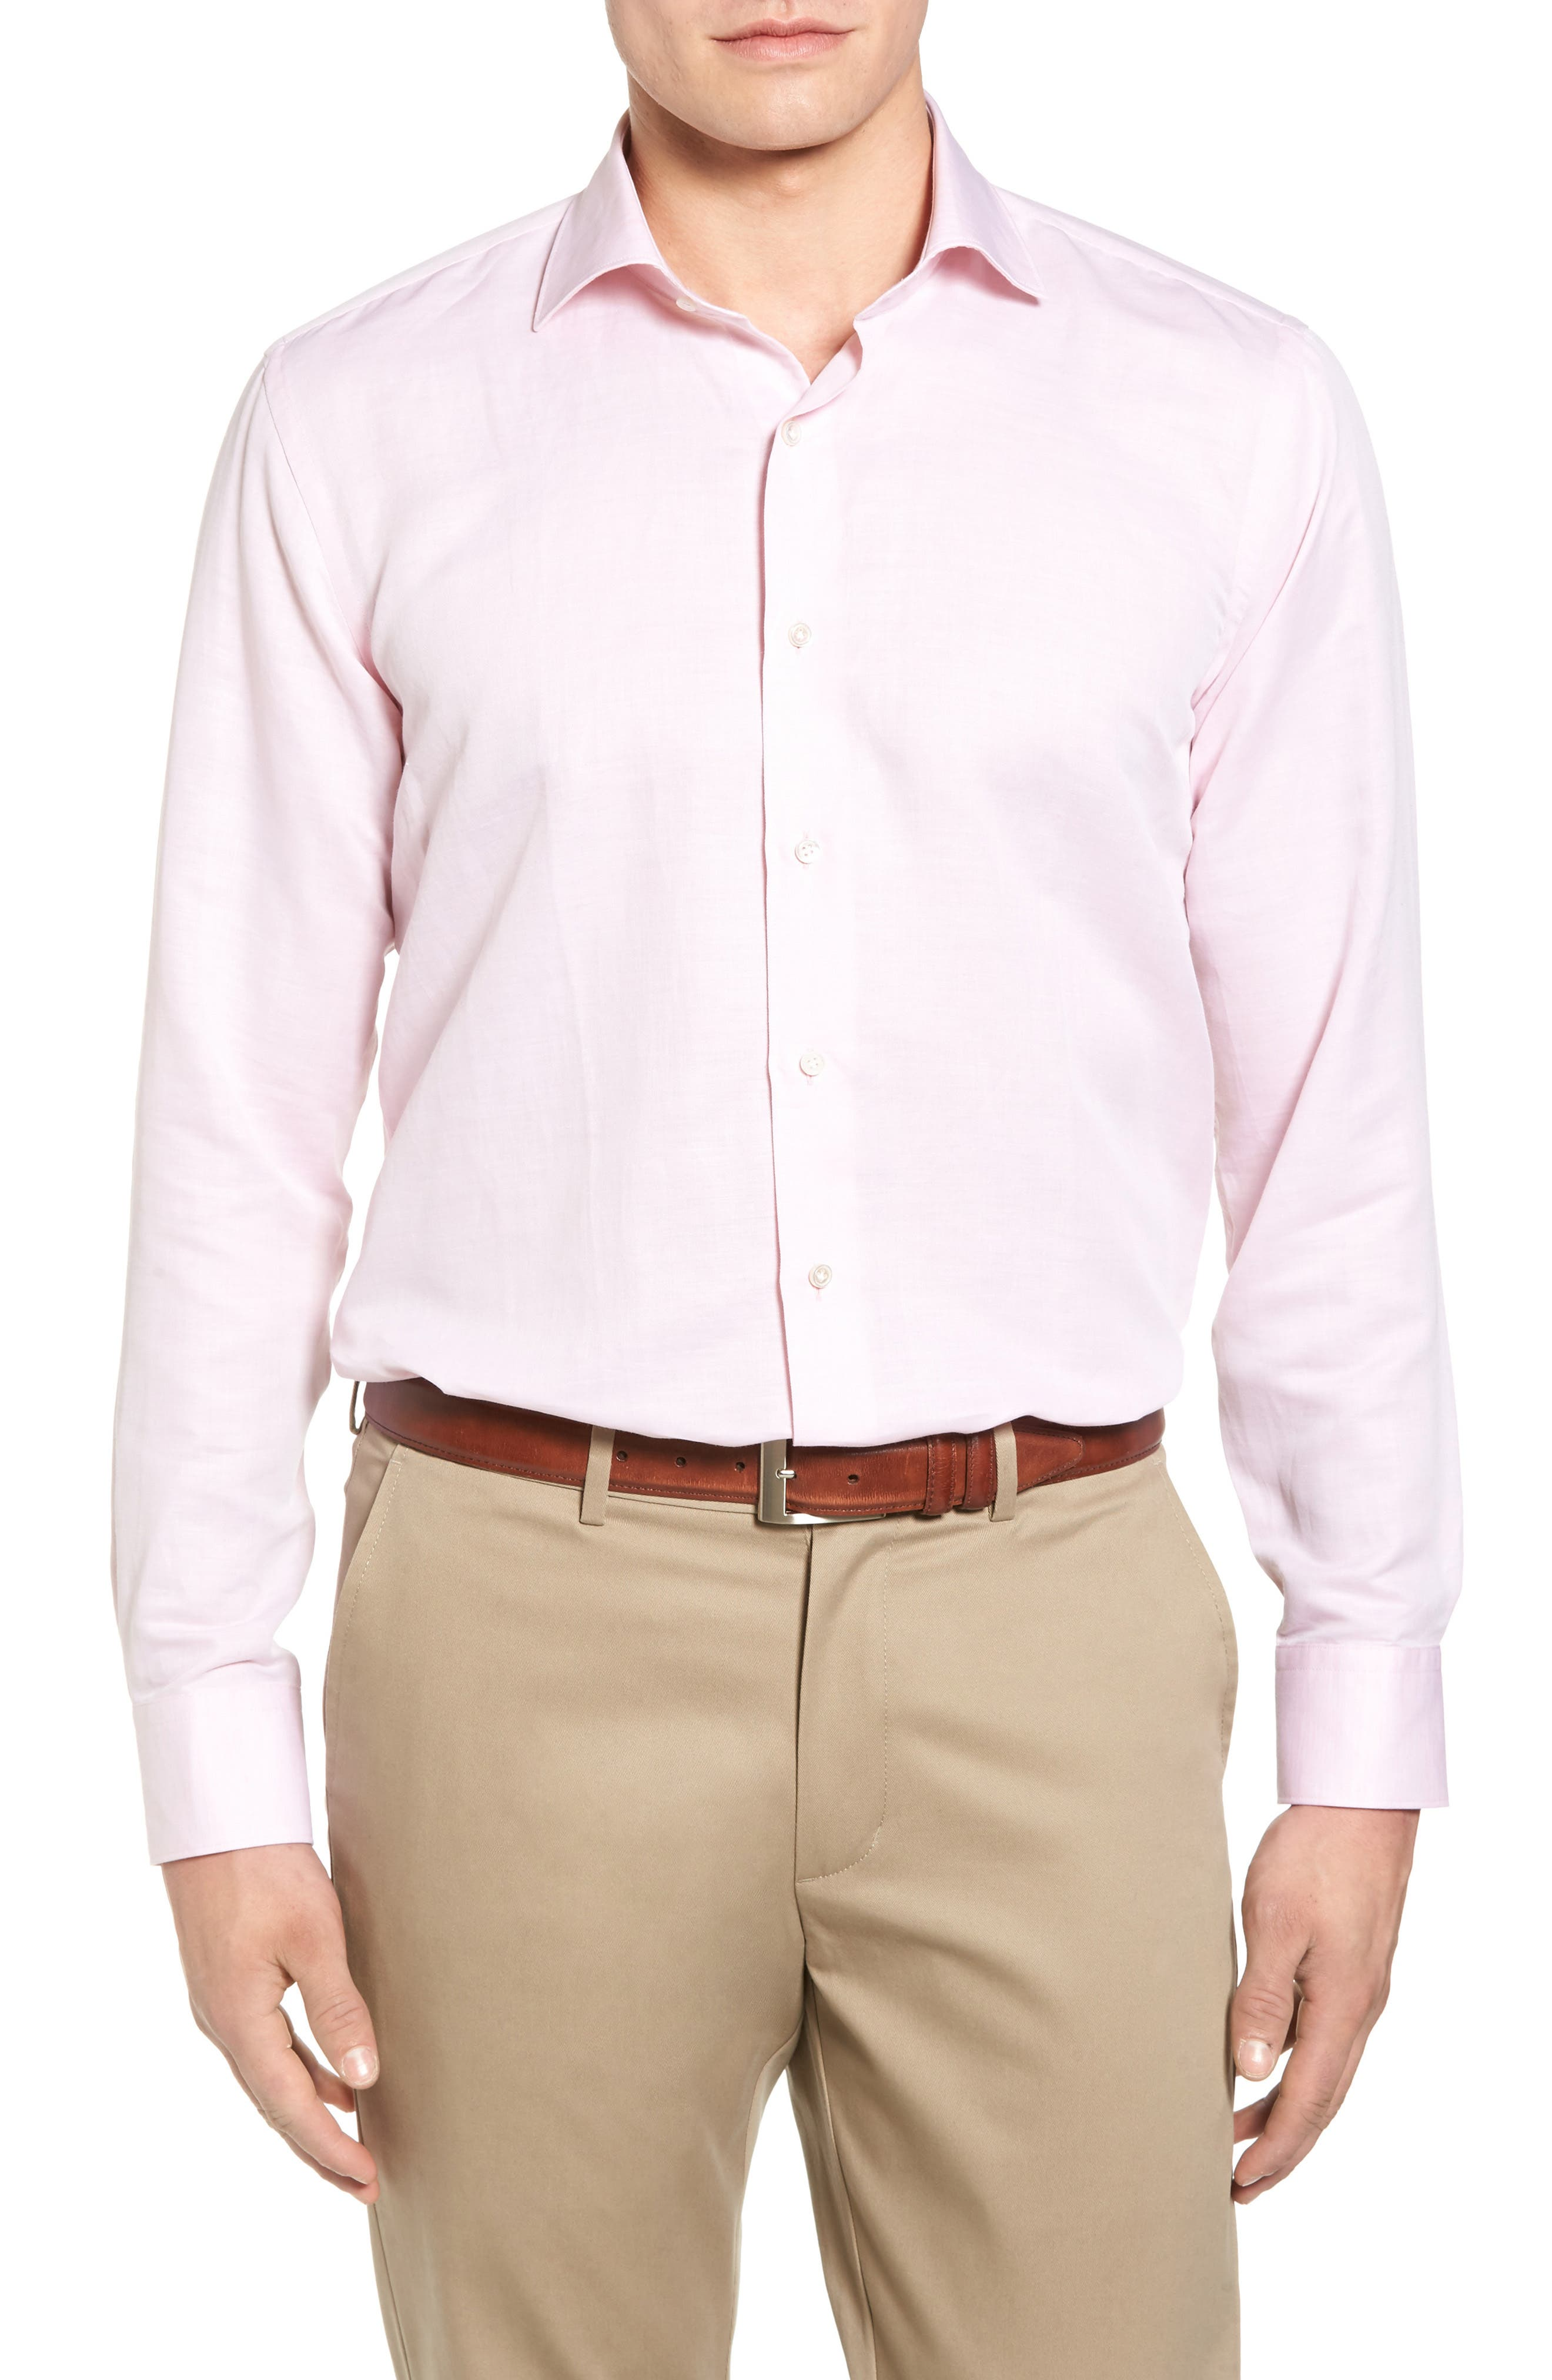 PETER MILLAR COLLECTION Linen & Cotton Sport Shirt, Main, color, 626